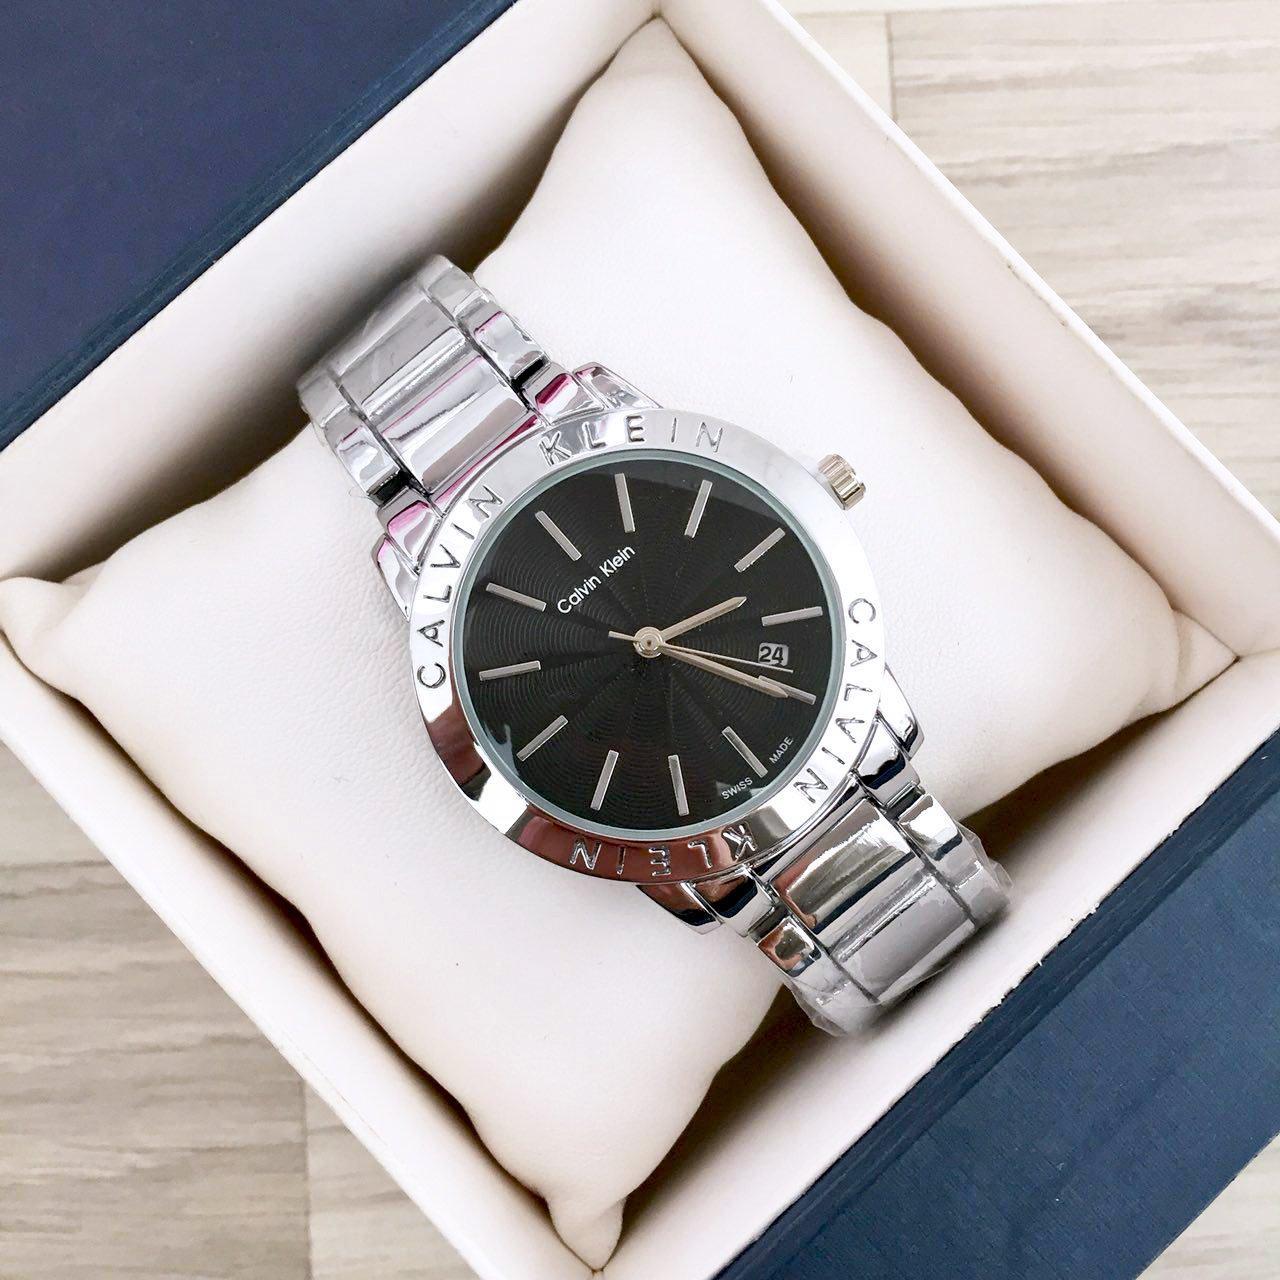 791b19fe16f90 Наручные мужские часы Calvin Klein SSB-1004-0305: продажа, цена в ...